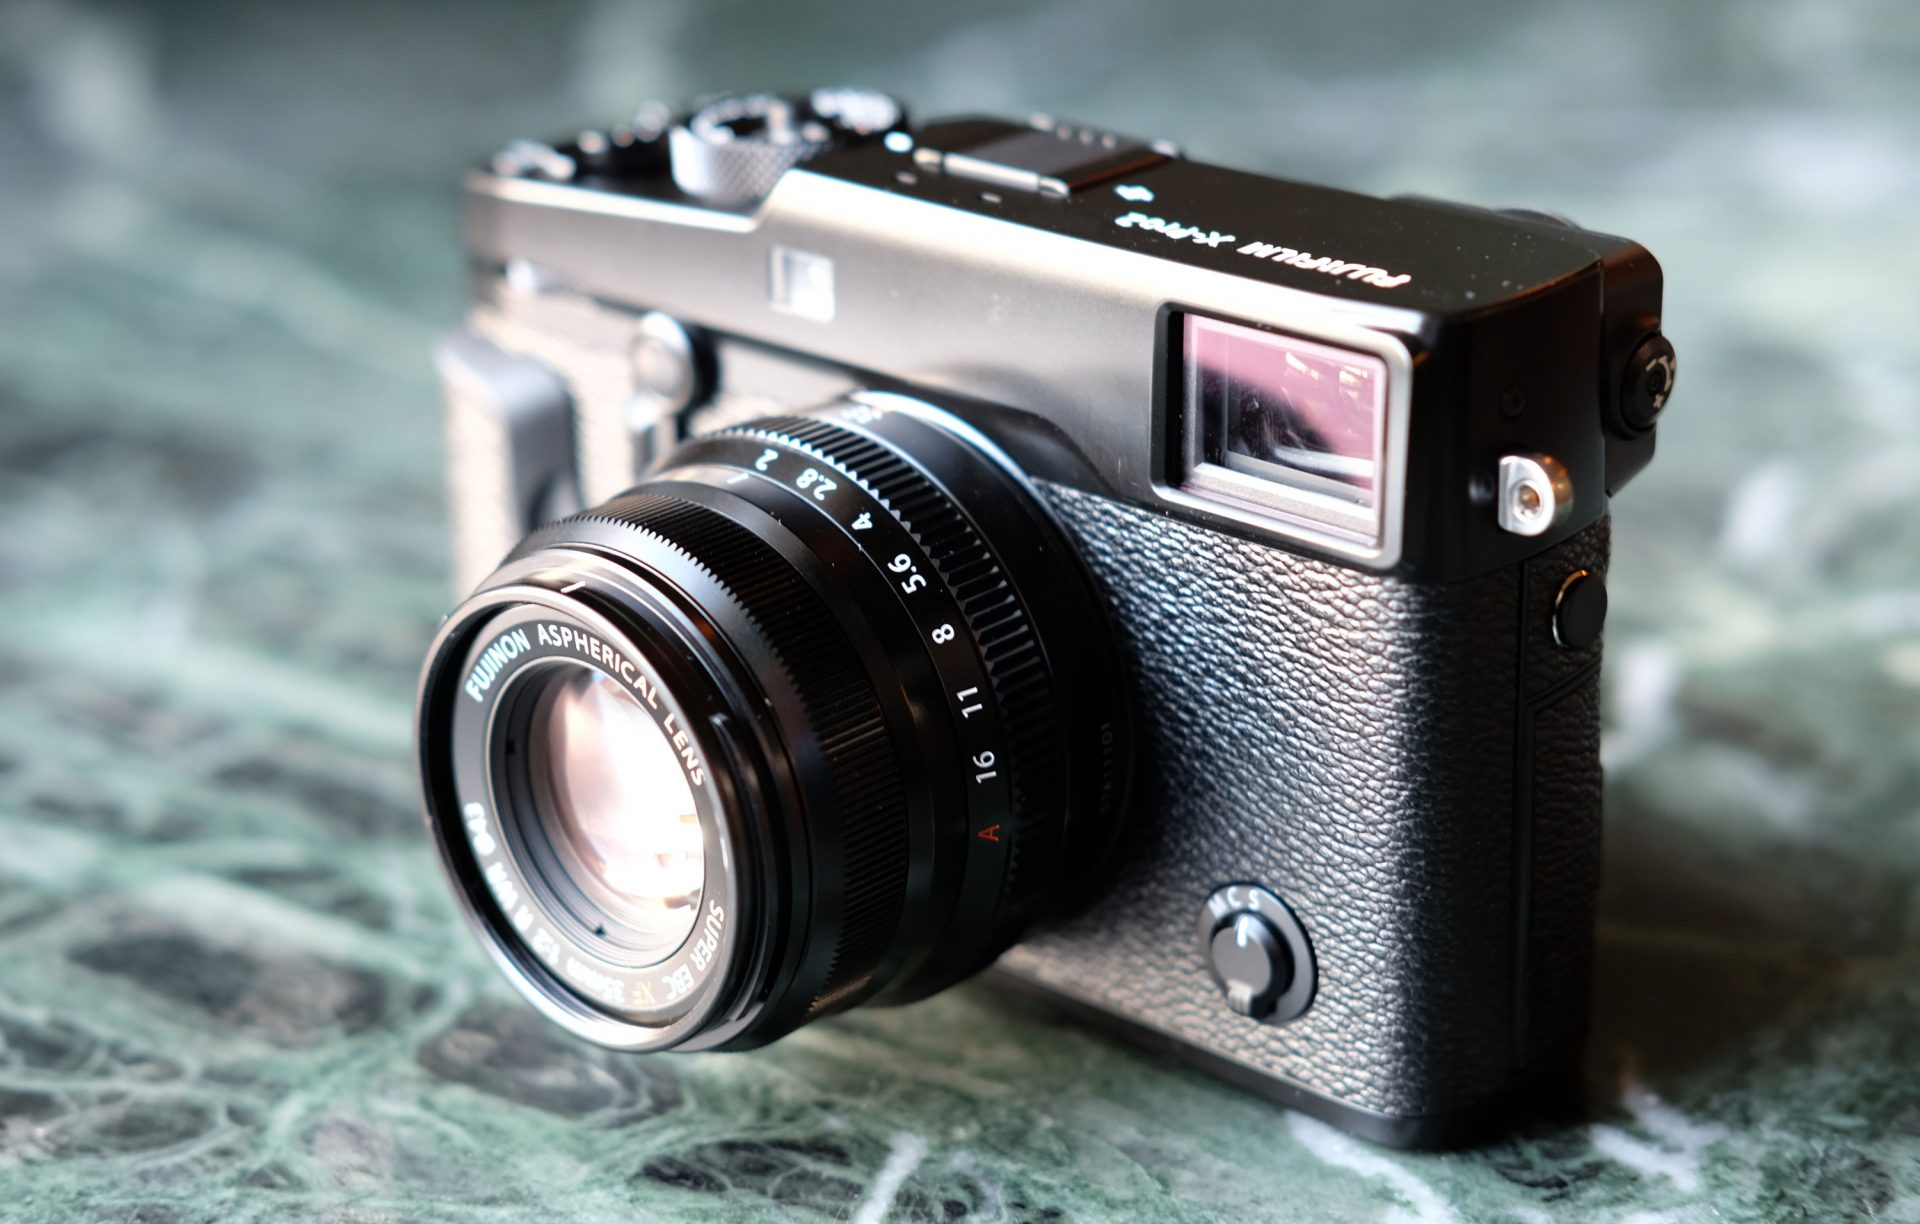 Fujifilm X Pro2 Review Cameralabs